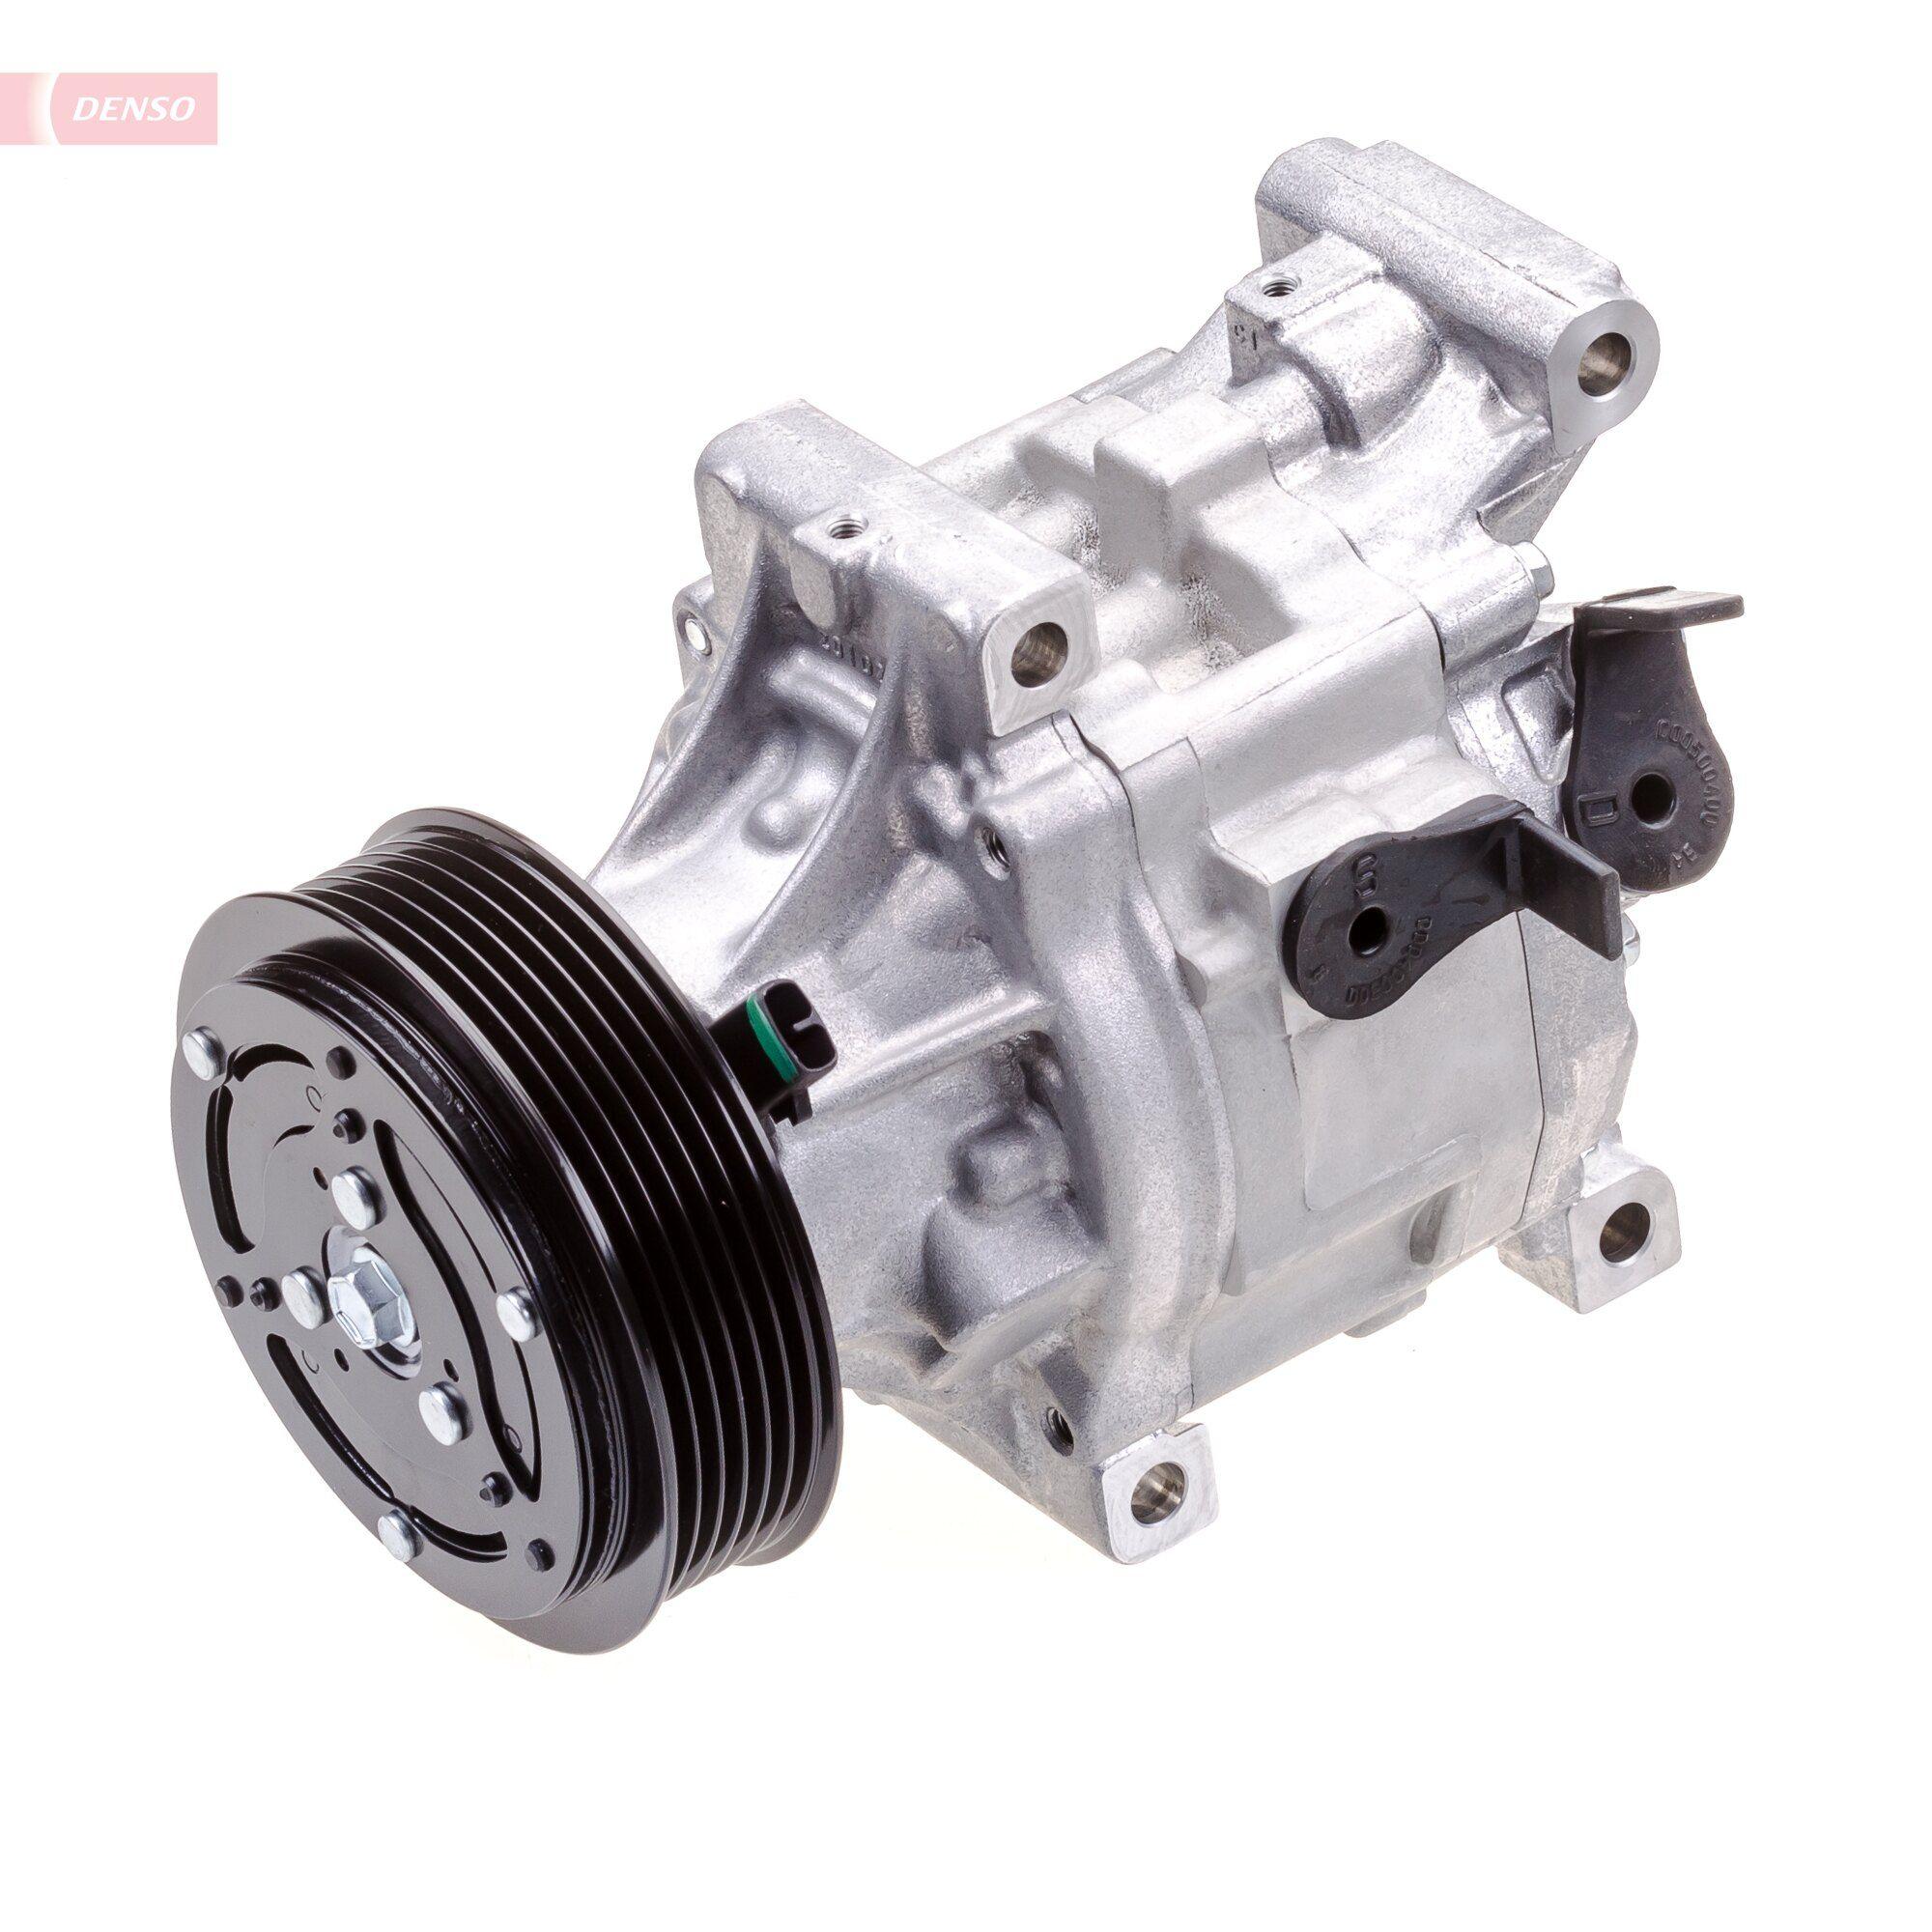 Kompressor Klimaanlage DENSO DCP09060